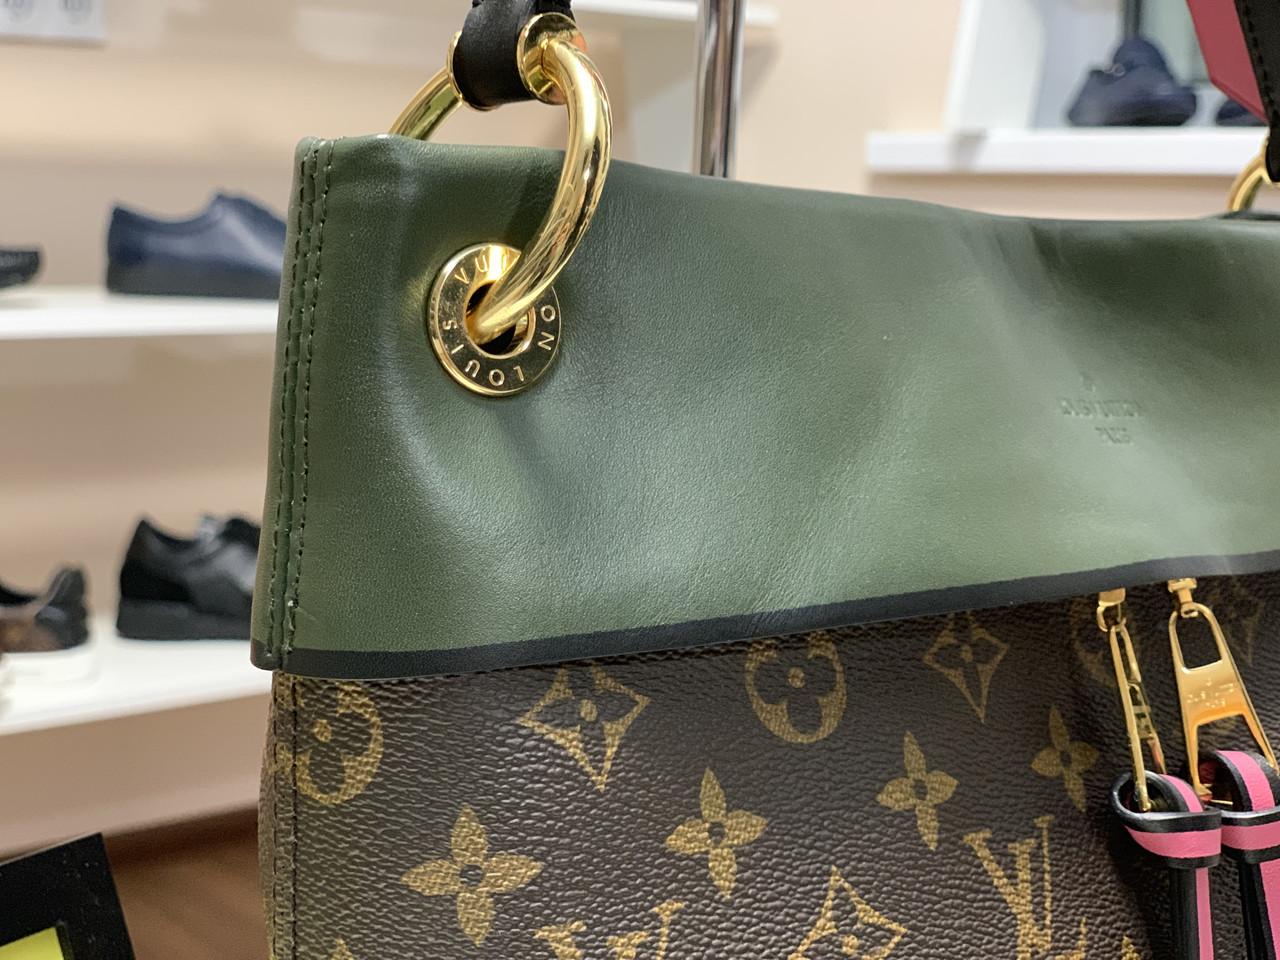 cd93b53fbc27 Женская сумка Louis Vuitton Tuileries Besace, цена 6 900 грн., купить в  Киеве — Prom.ua (ID#565802306)